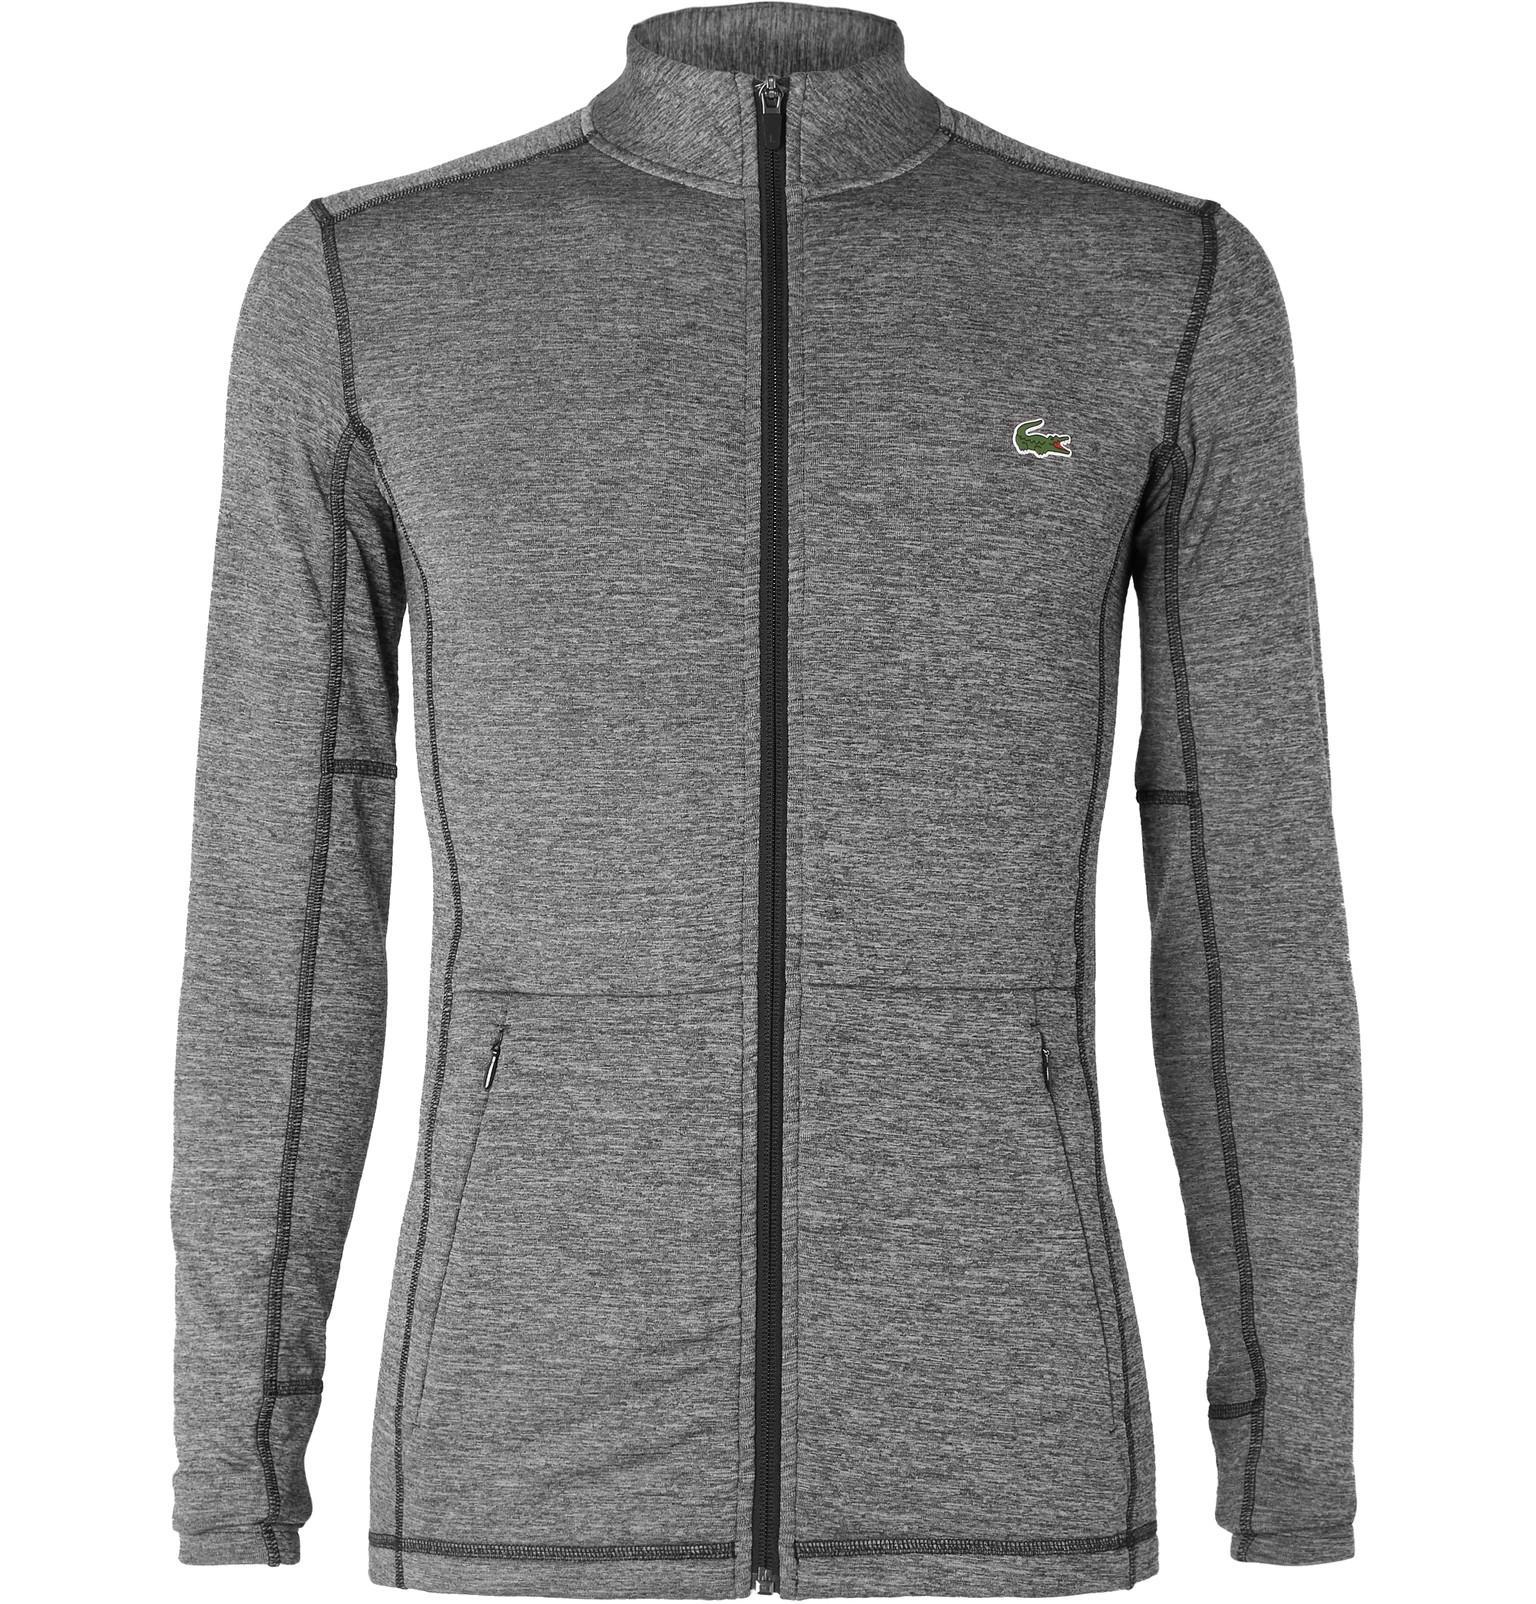 5a7247b28112f2 Lyst - Lacoste Sport Novak Djokovic Stretch-jersey Zip-up Jacket in ...